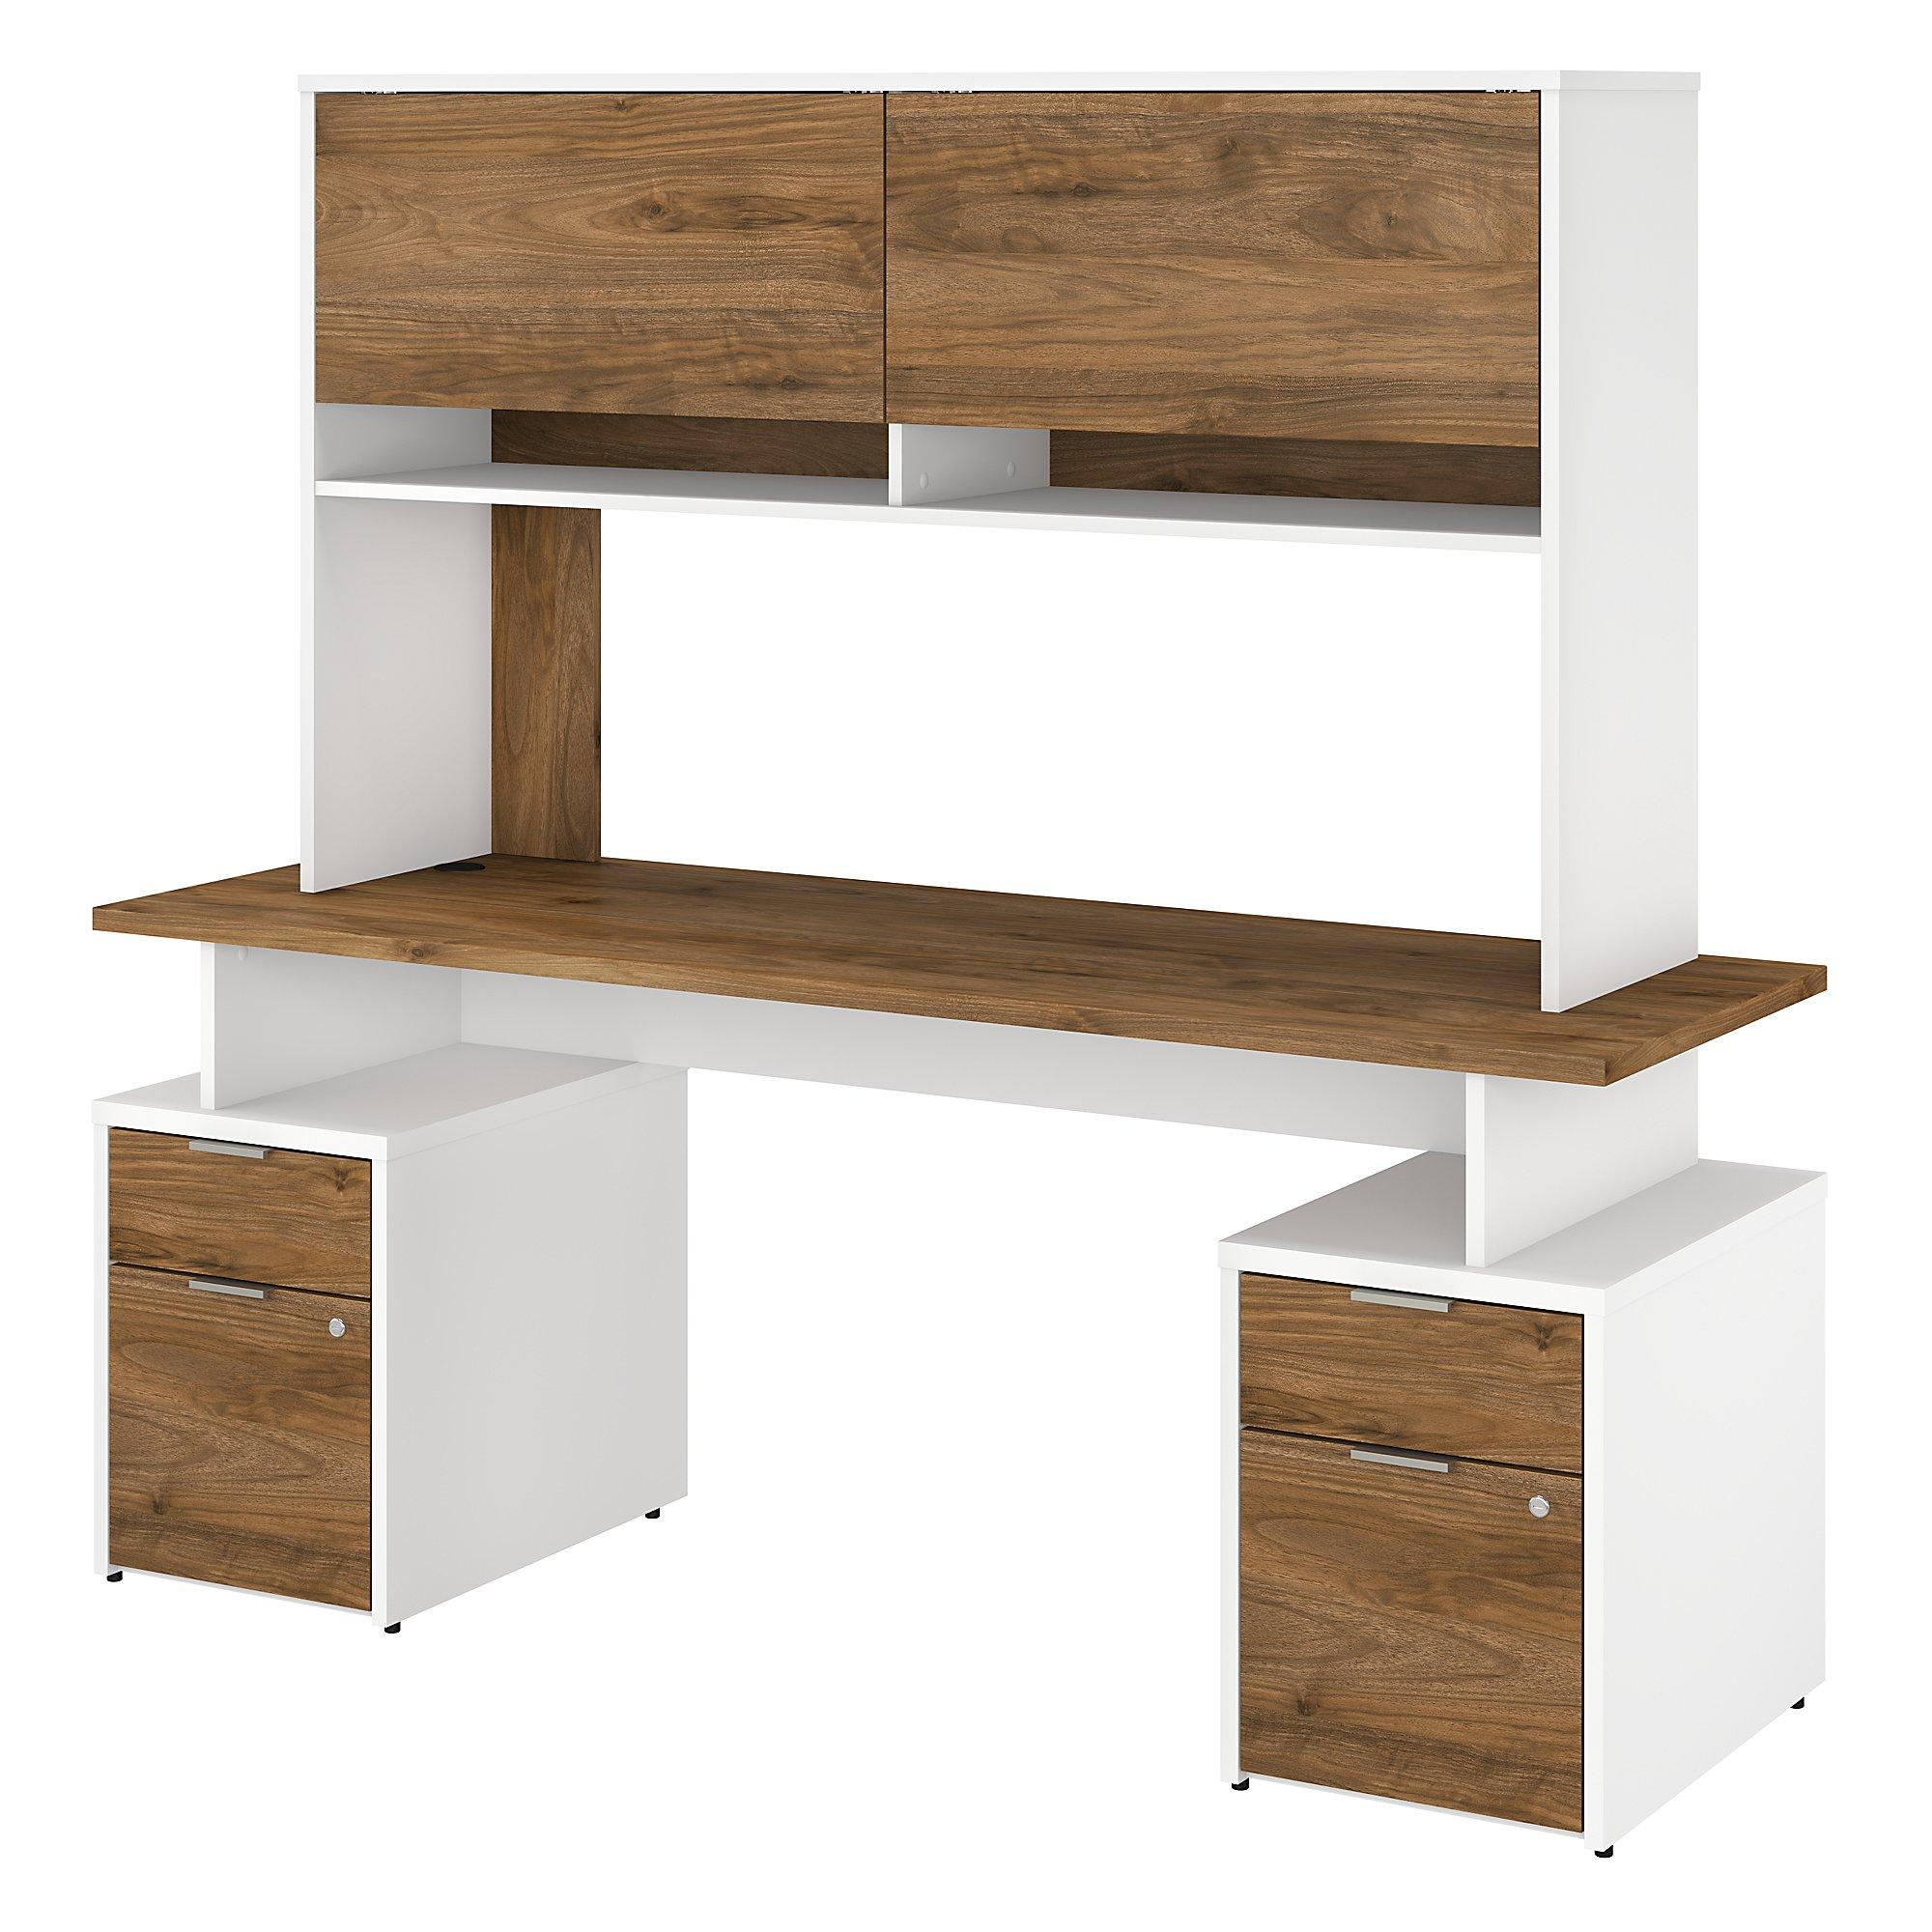 jtn006 fresh walnut and white jamestown desk